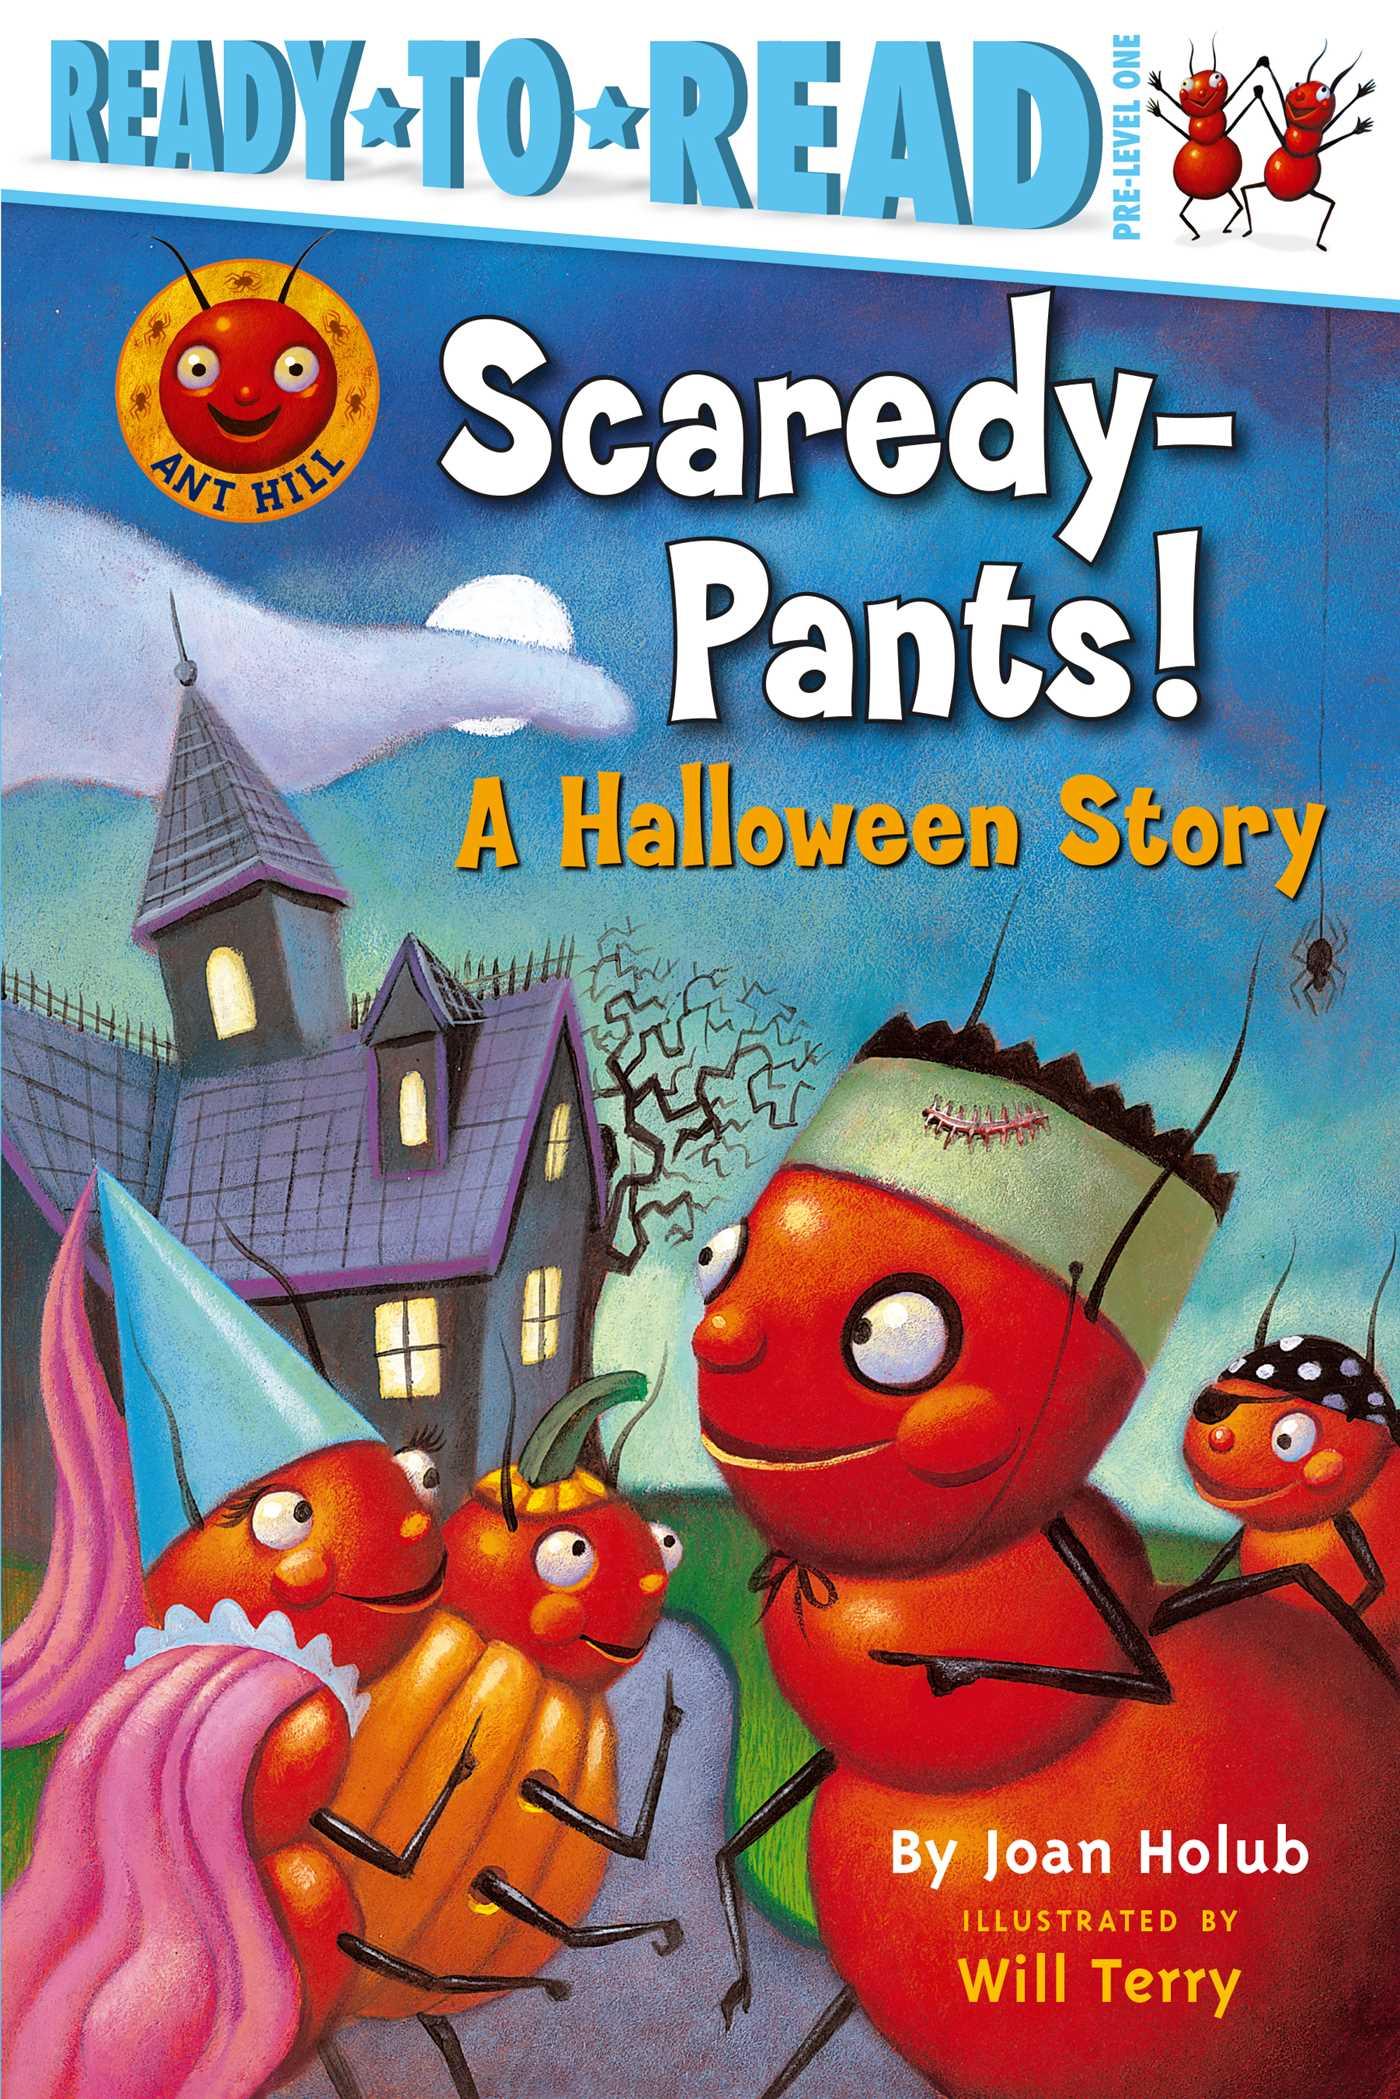 Scaredy pants 9781442426290 hr